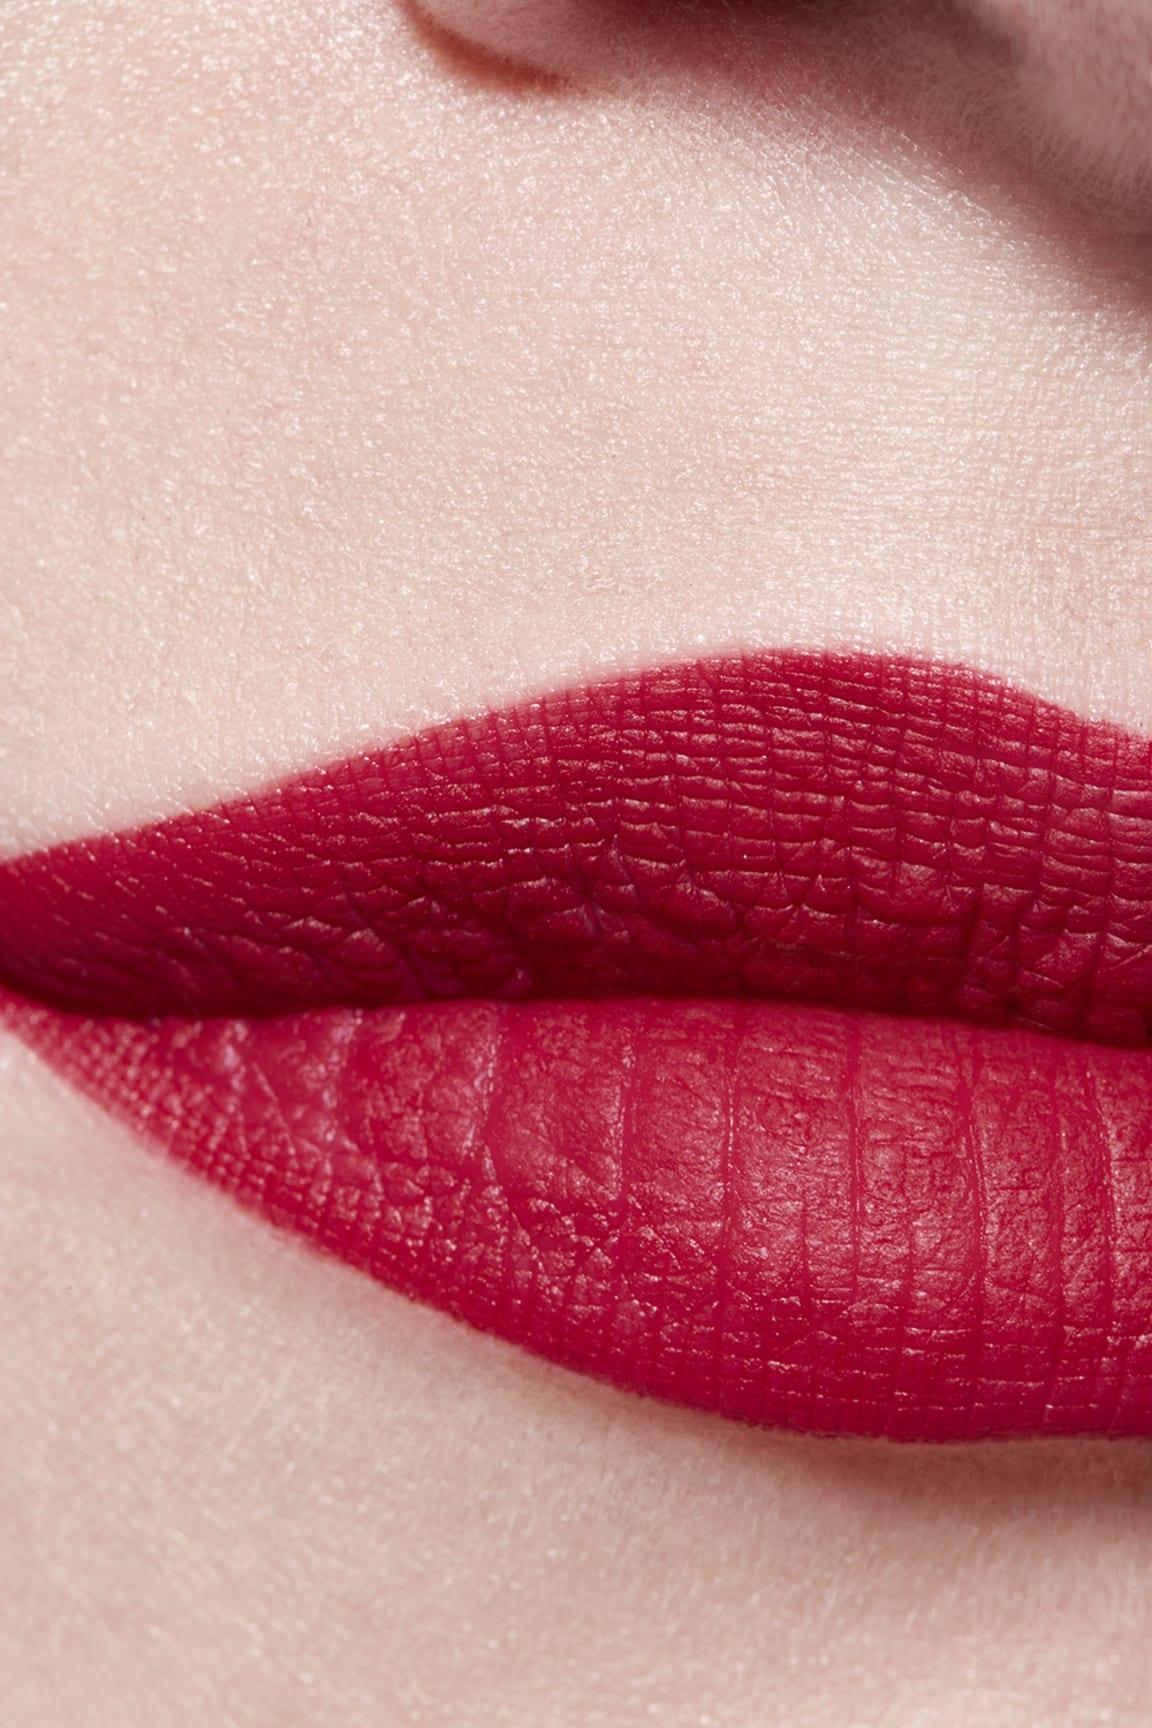 Application makeup visual 3 - ROUGE ALLURE VELVET 56 - ROUGE CHARNEL